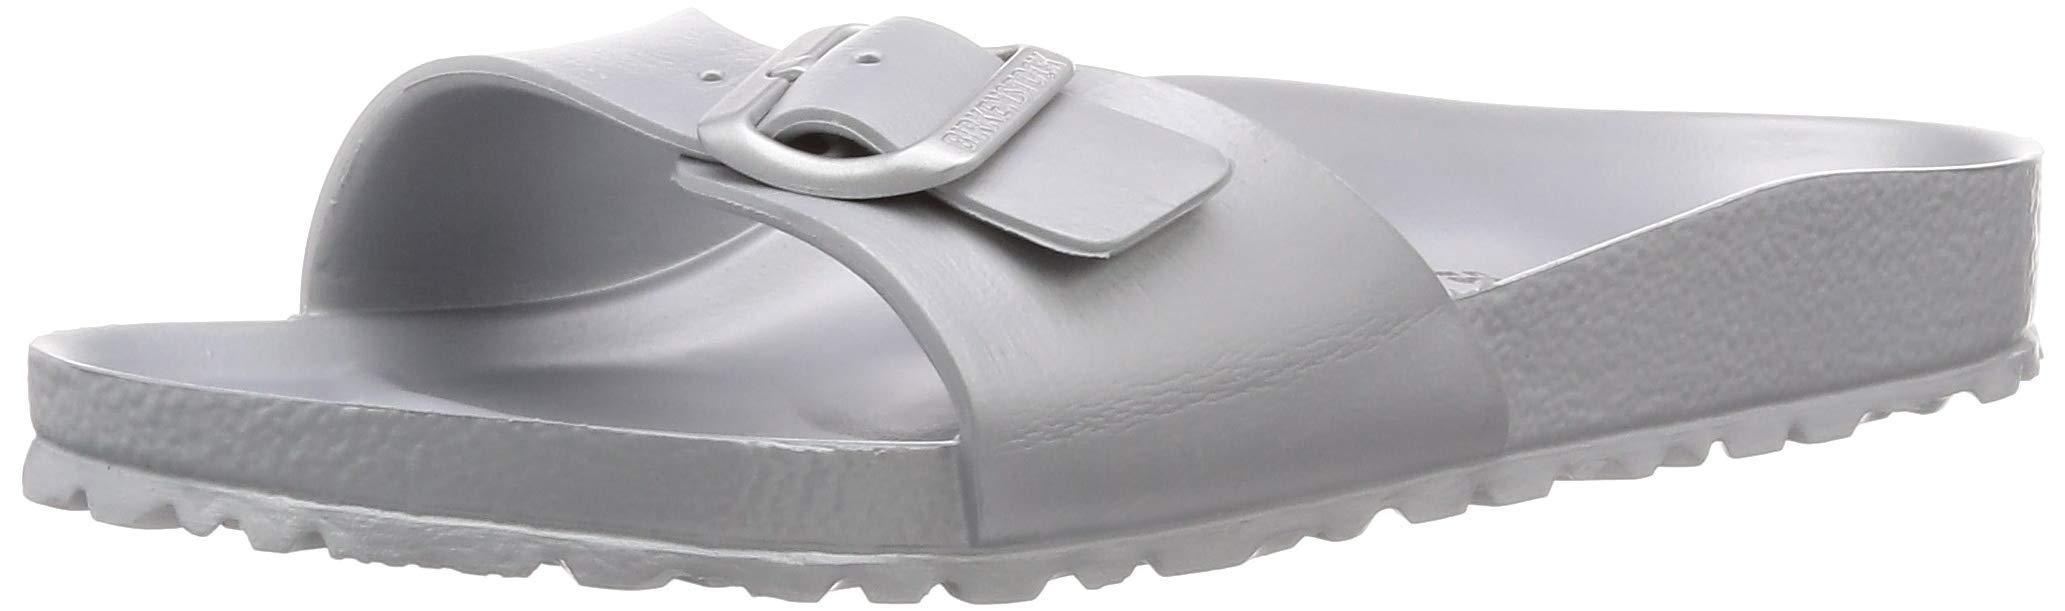 Birkenstock Arizona EVA Metallic Silver EVA Adult Flat Sandals